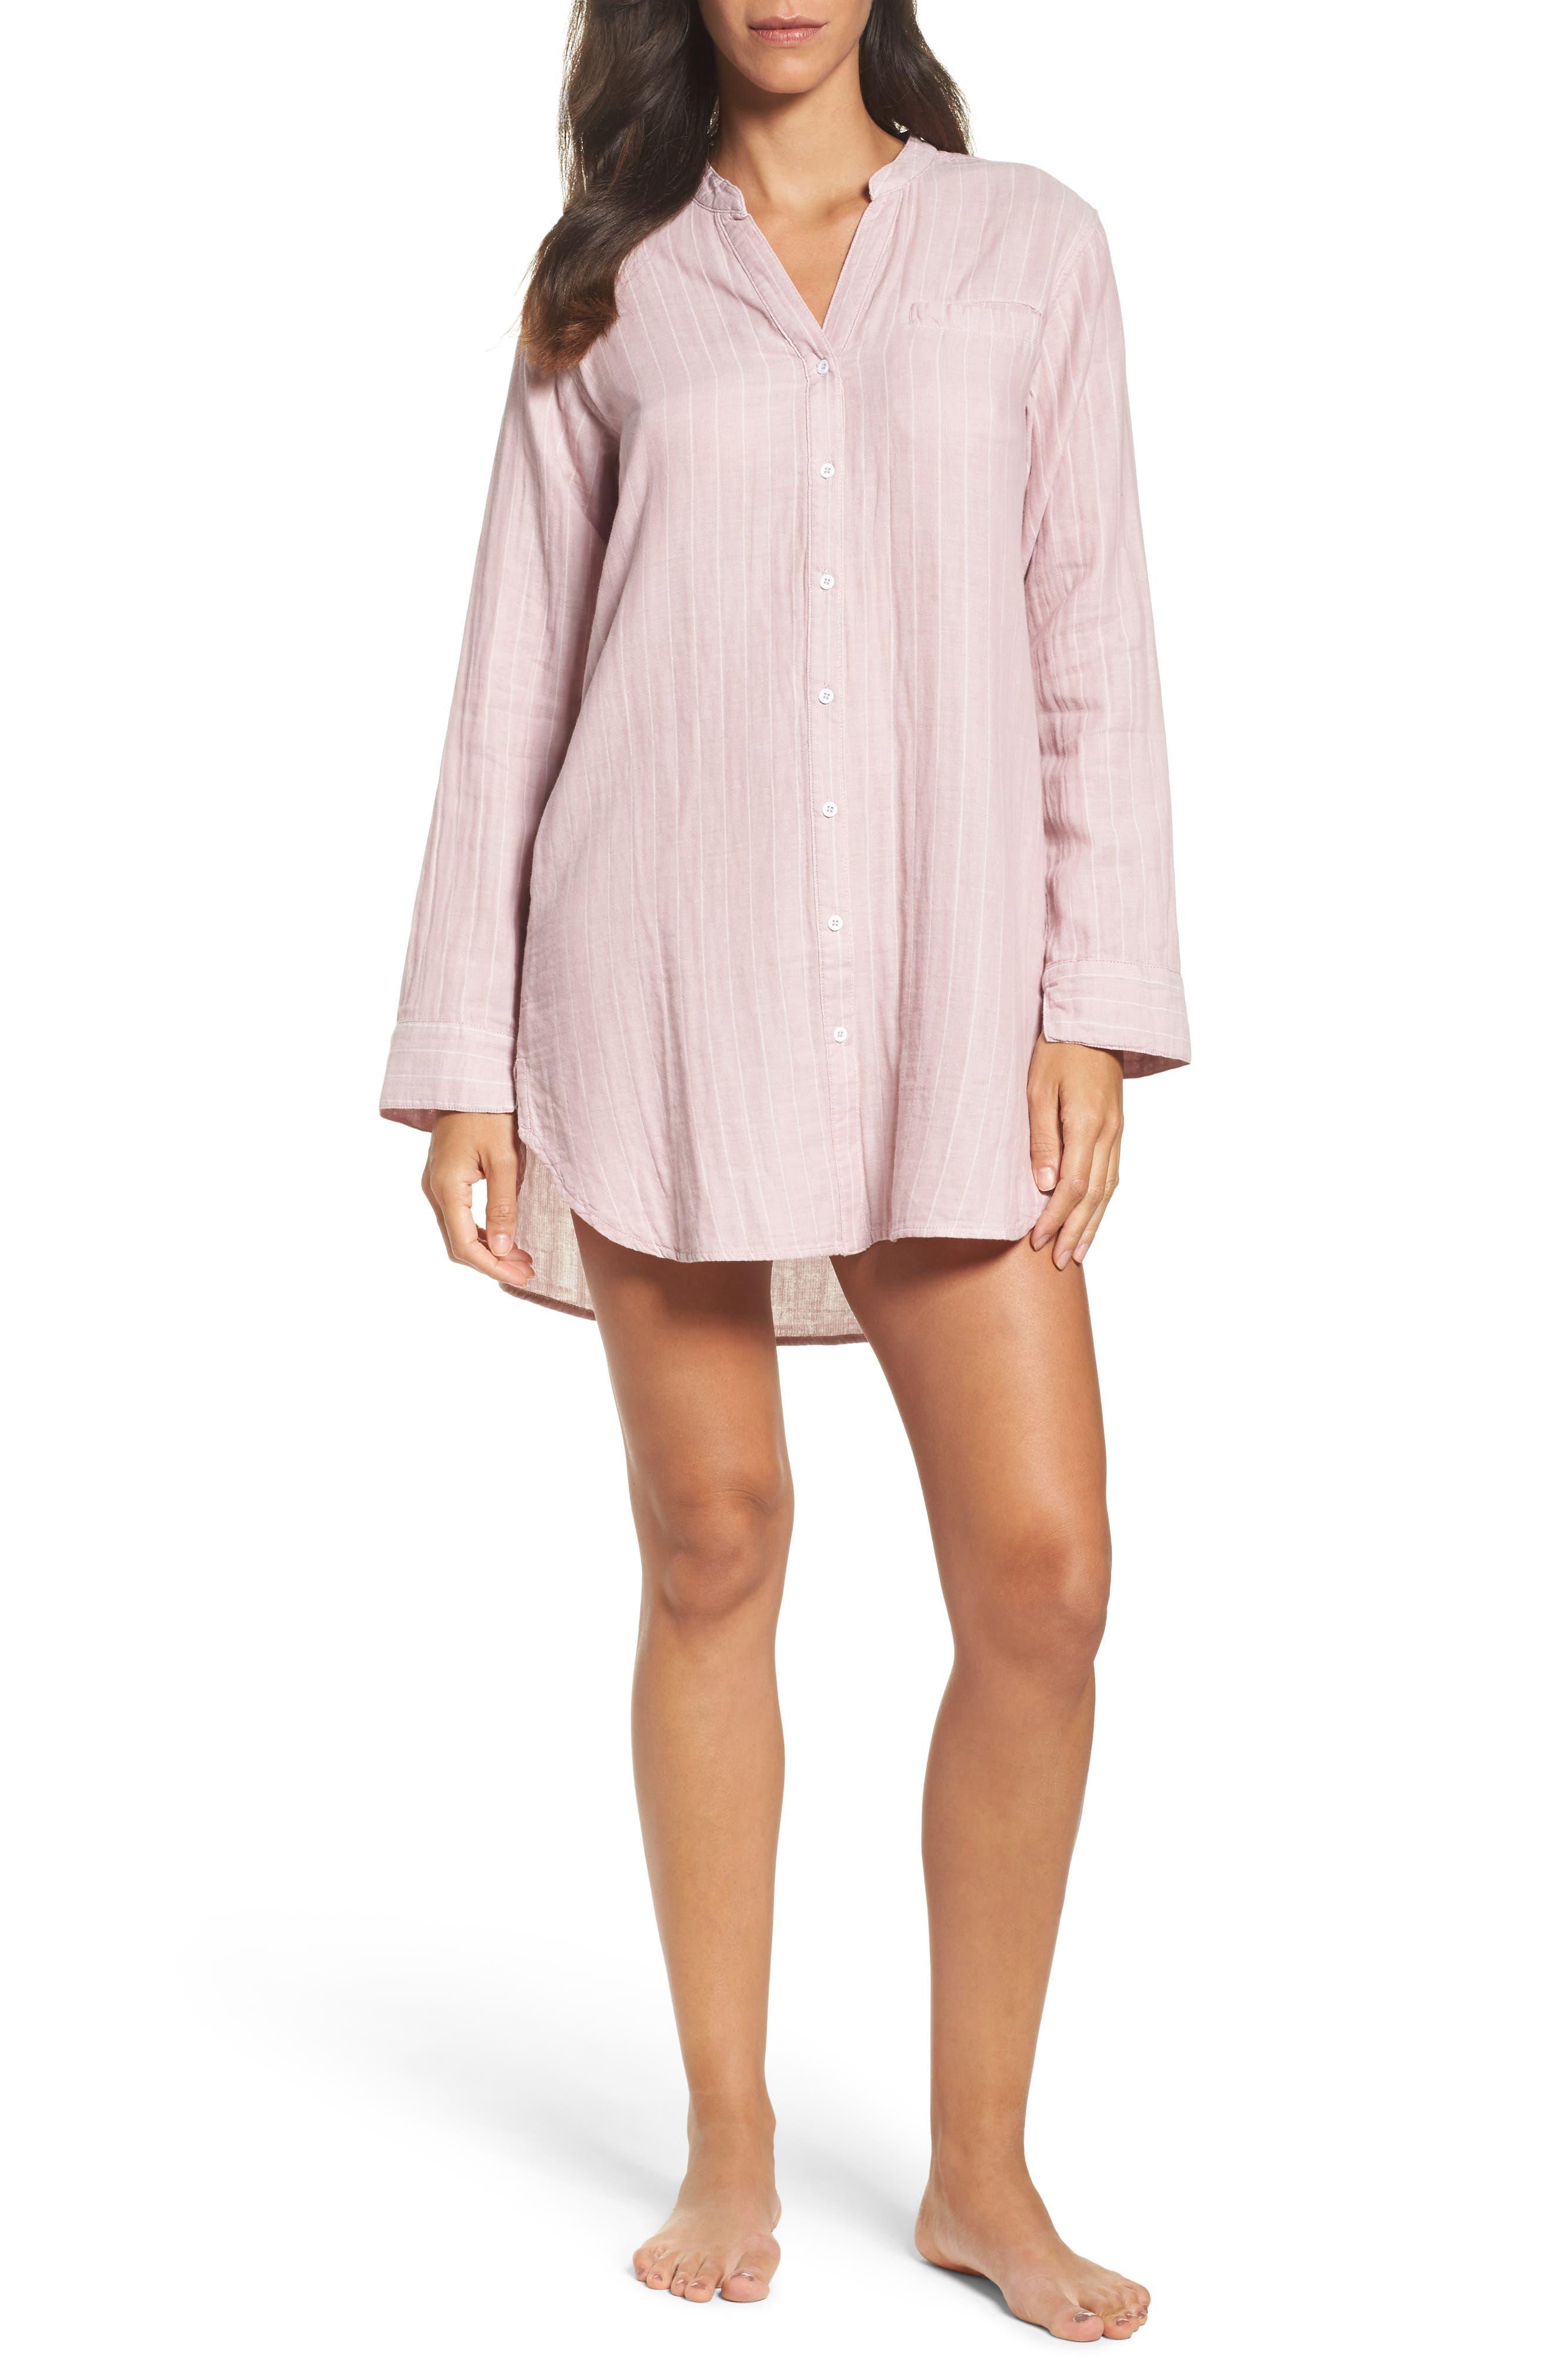 UGG Vivian Stripe Sleep Shirt